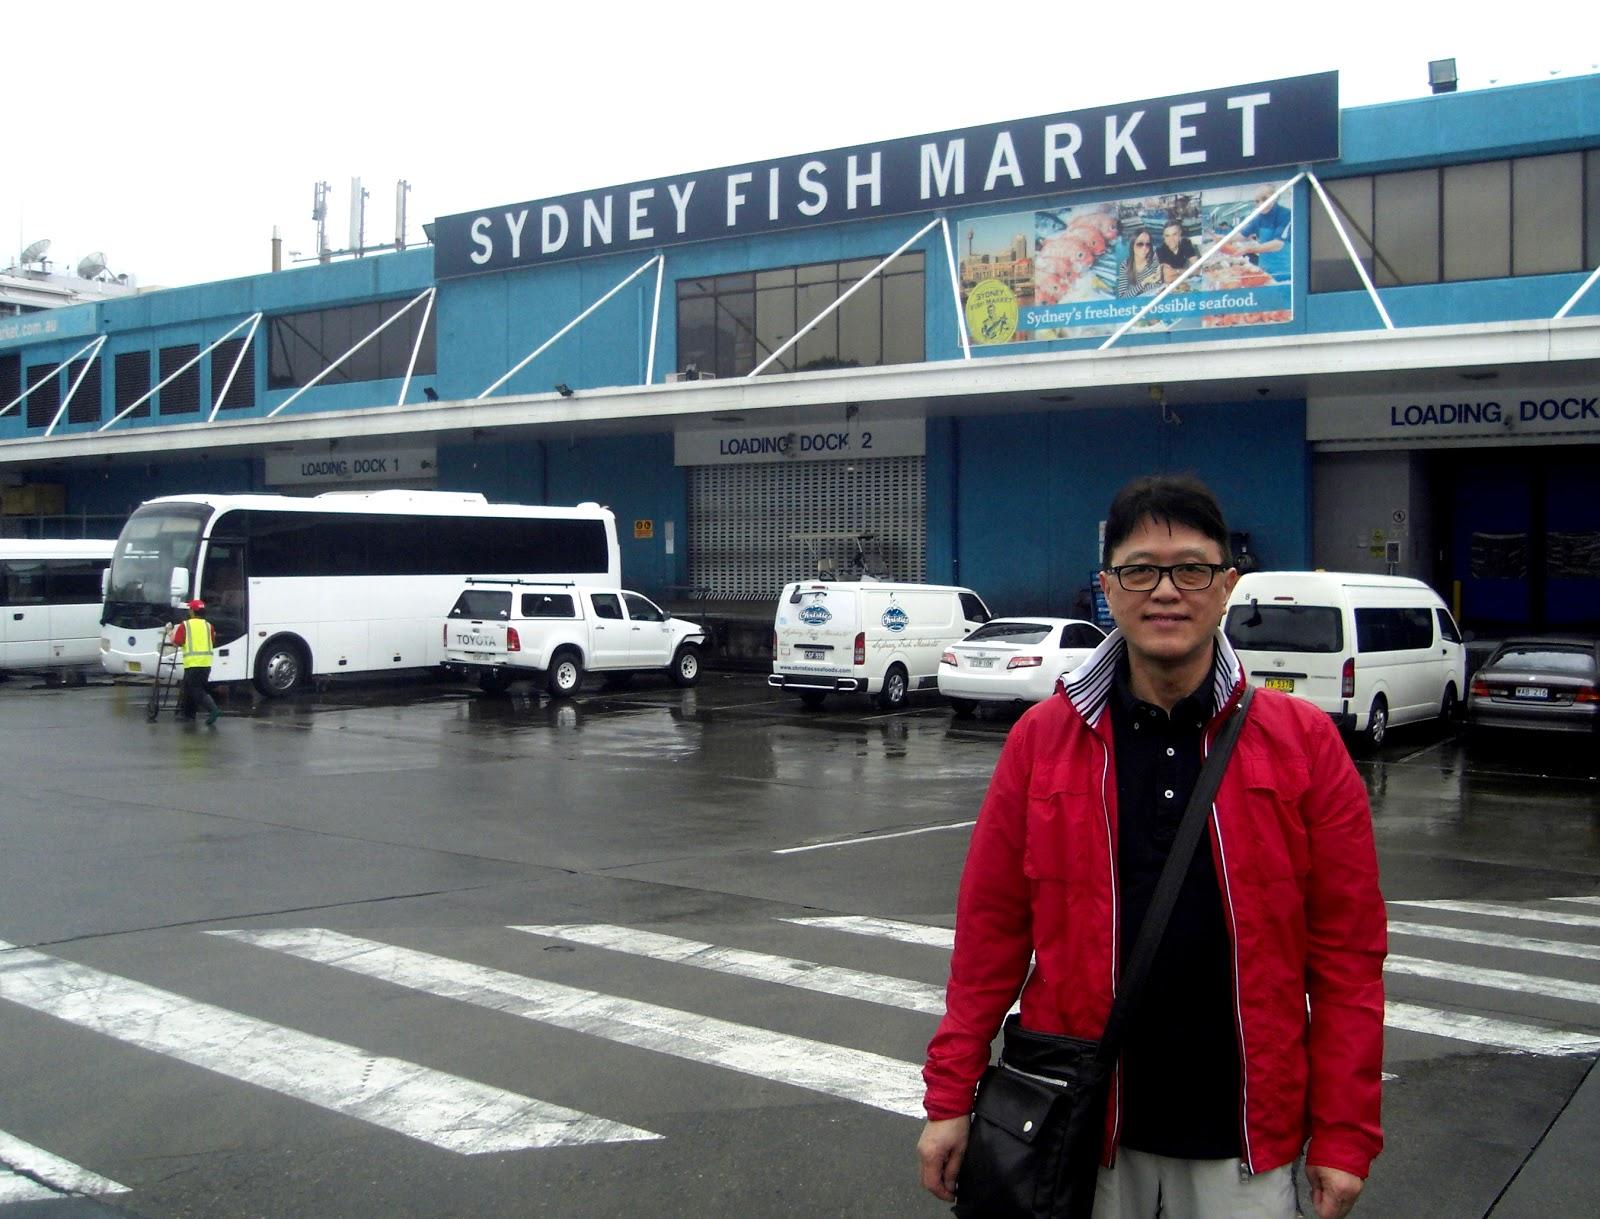 Travel blog sydney melbourne 10 days trip feb 22 to mar for La fish market